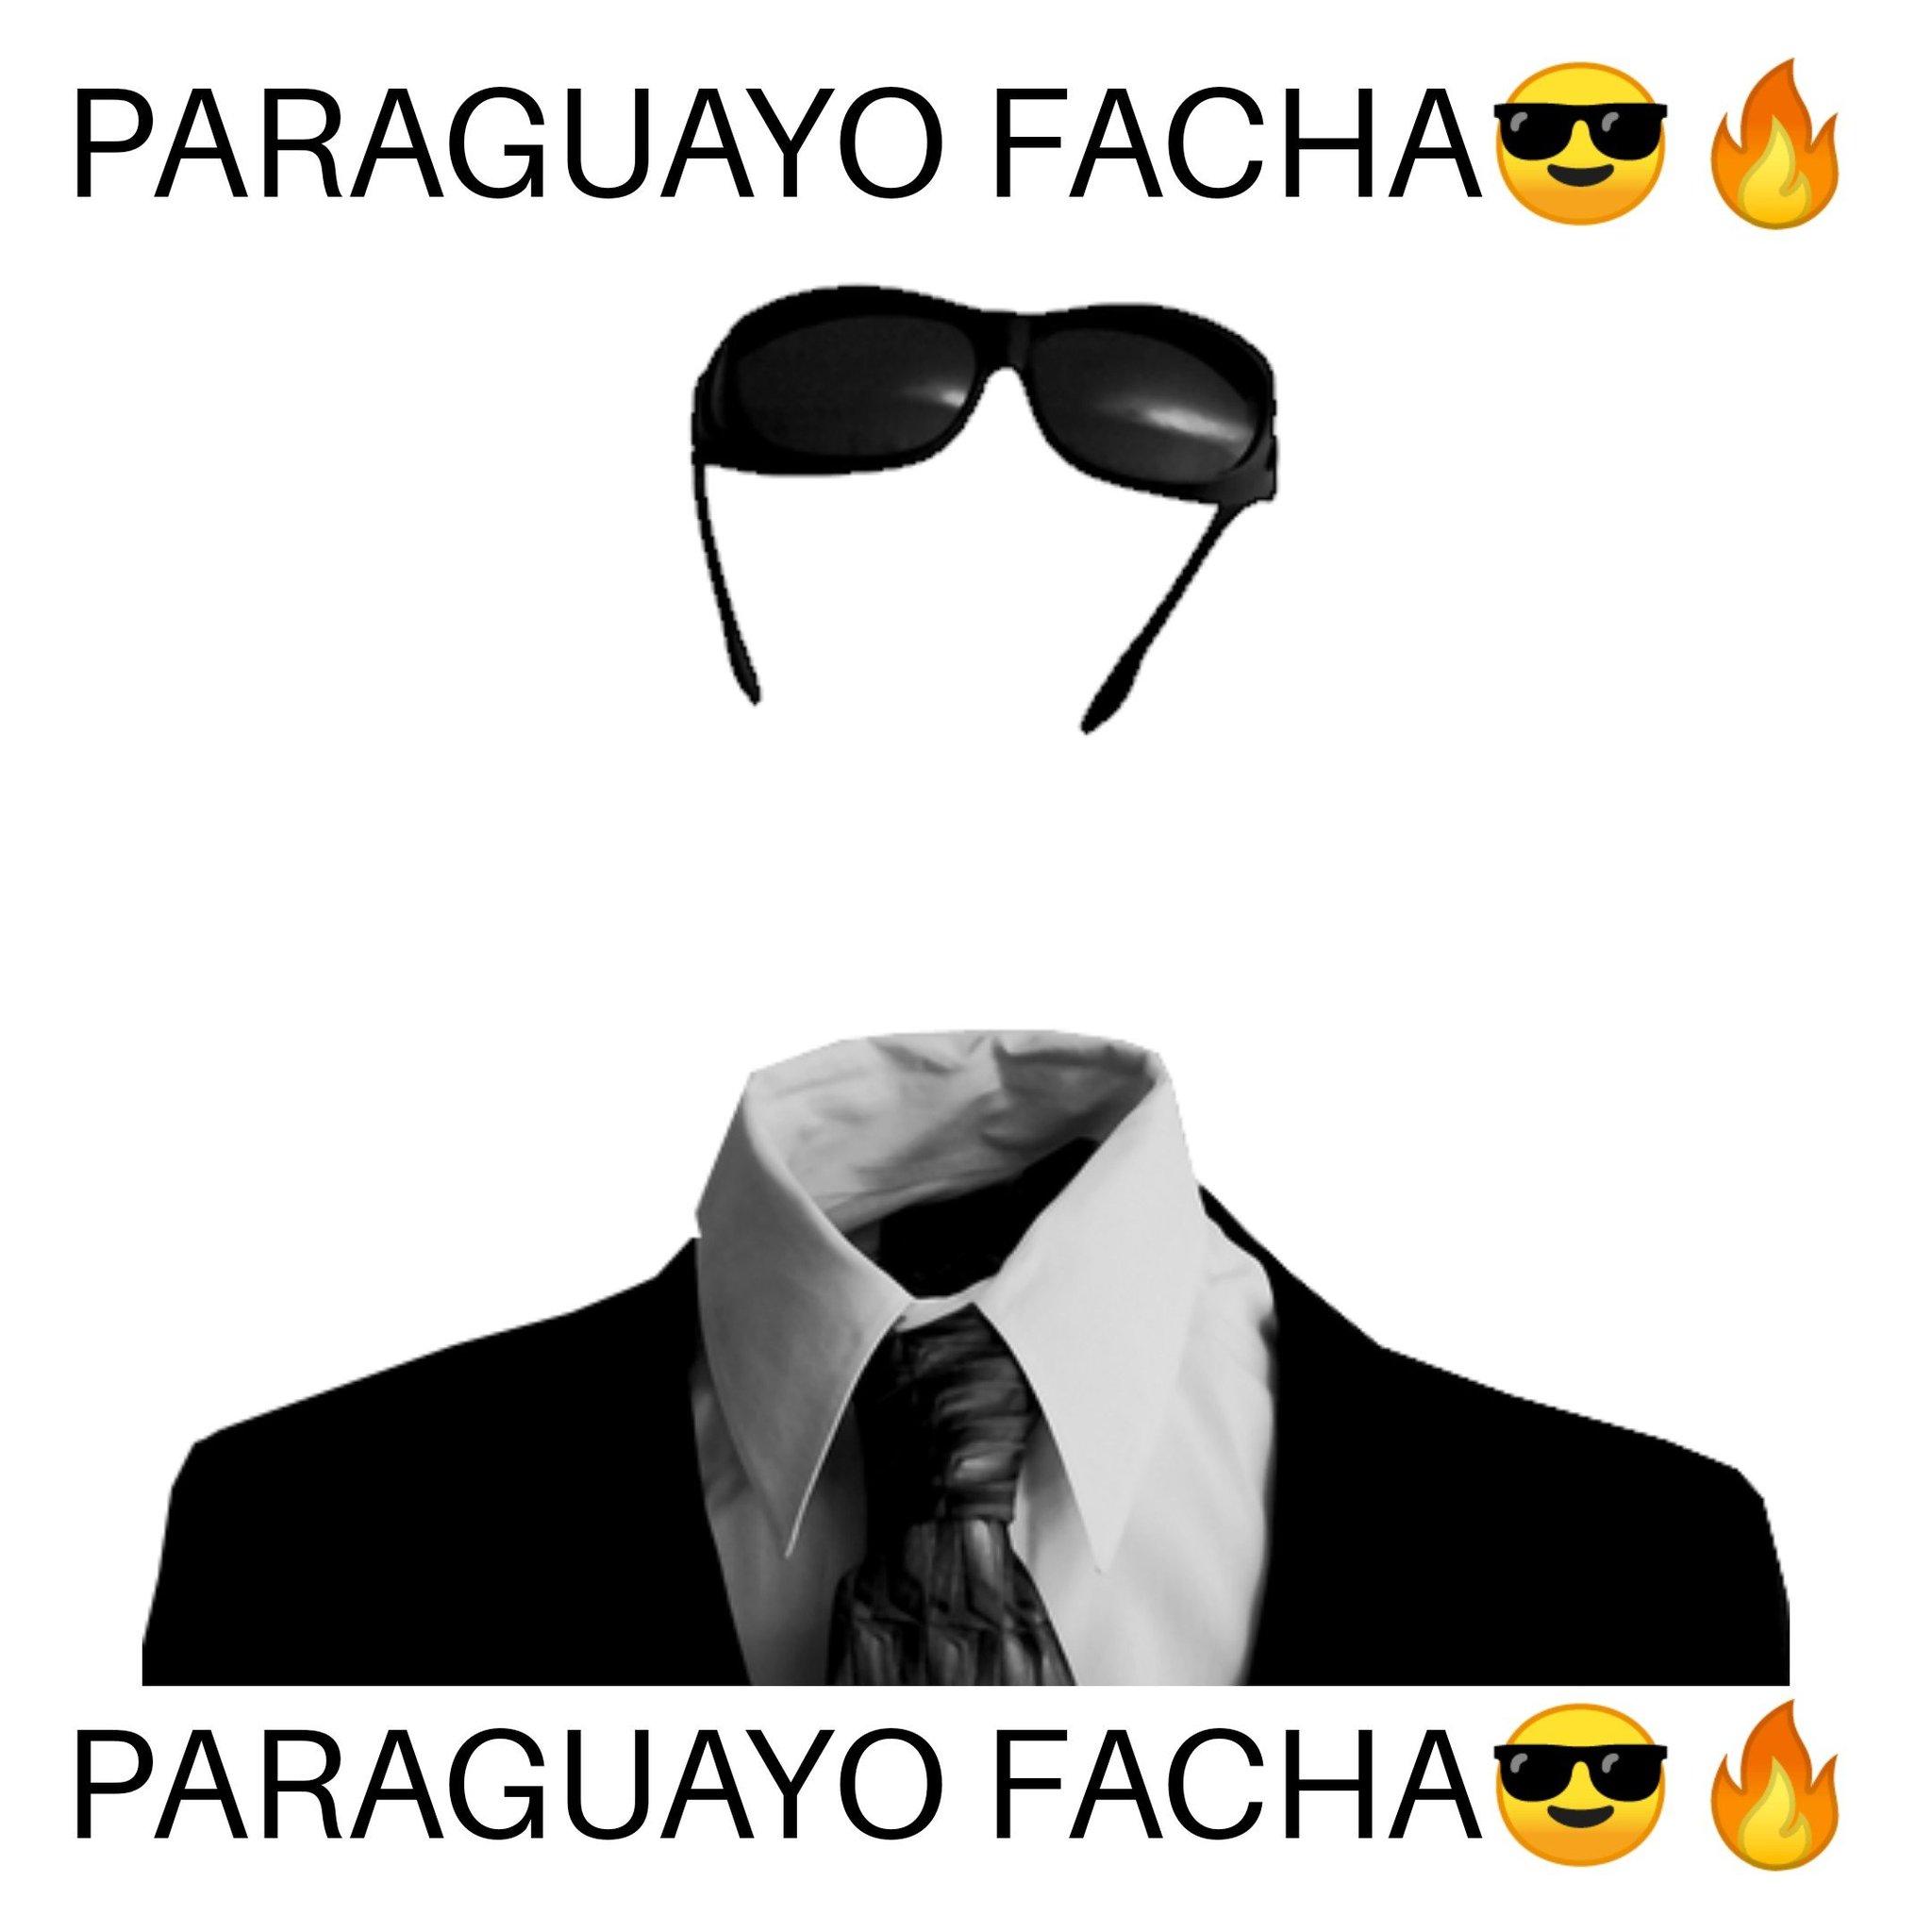 PARAGUAYO FACHA  - meme